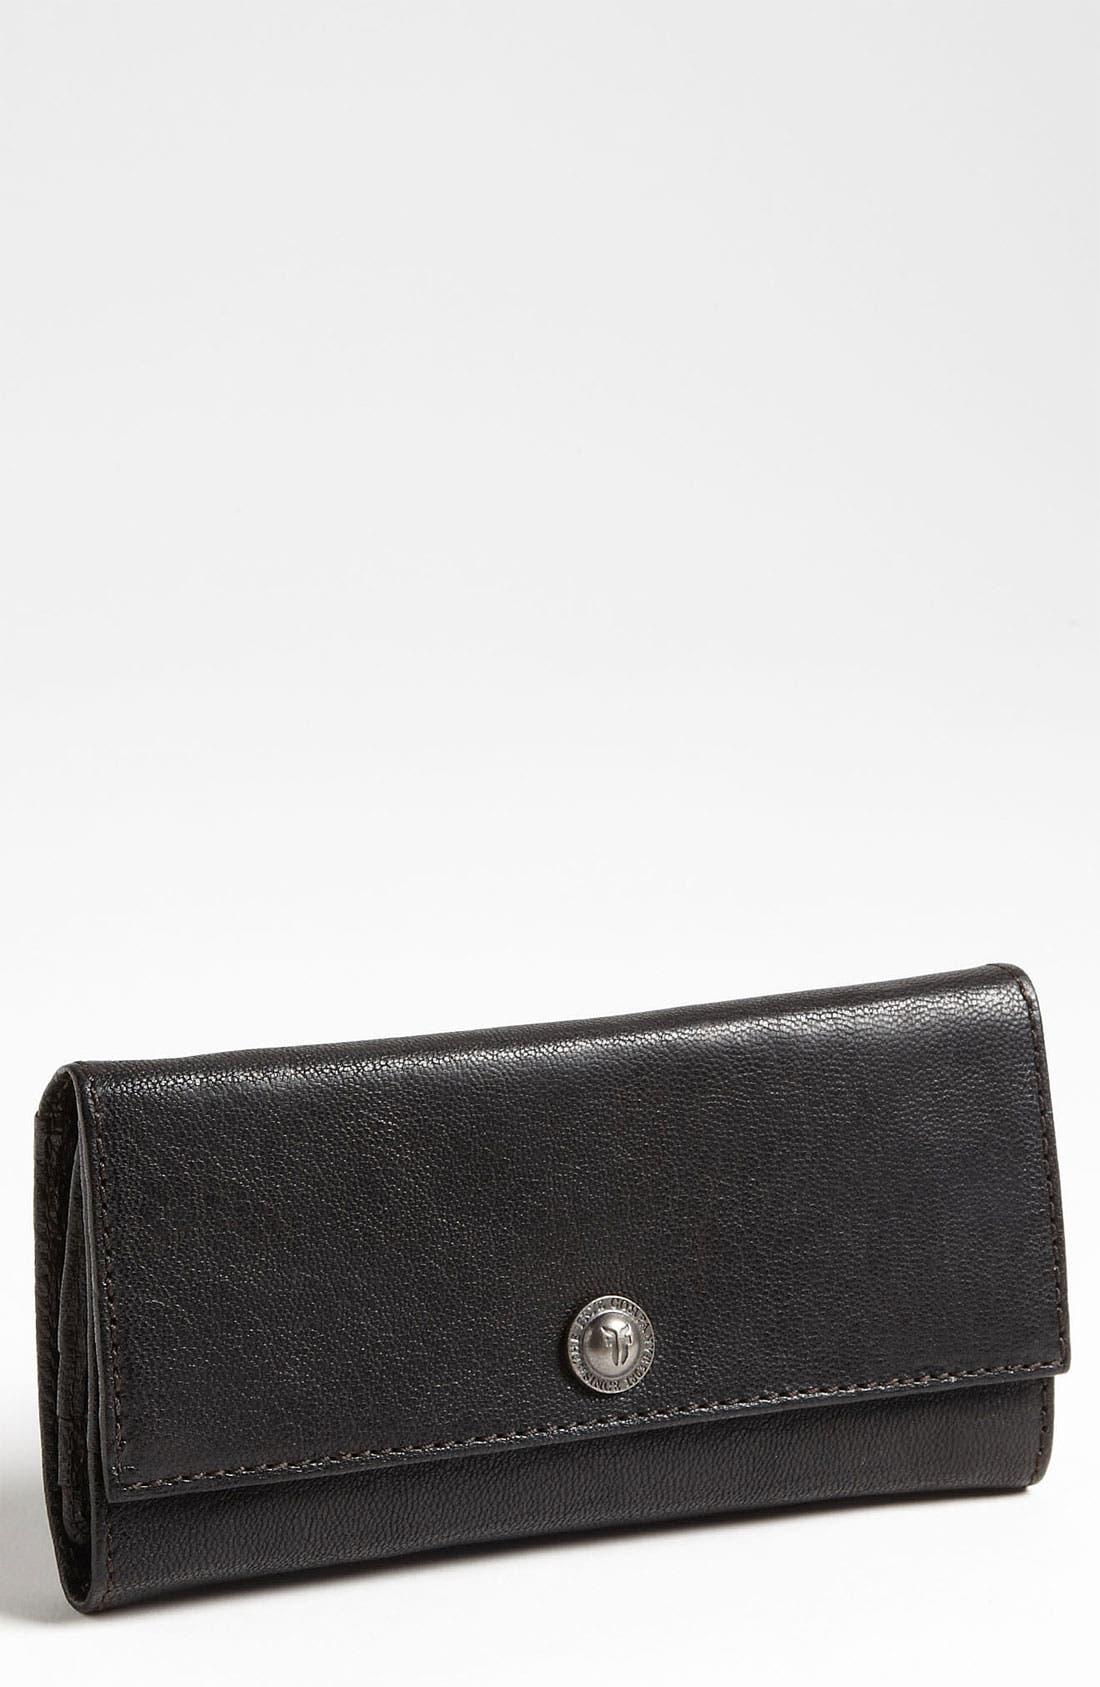 Alternate Image 1 Selected - Frye 'Melissa' Wallet